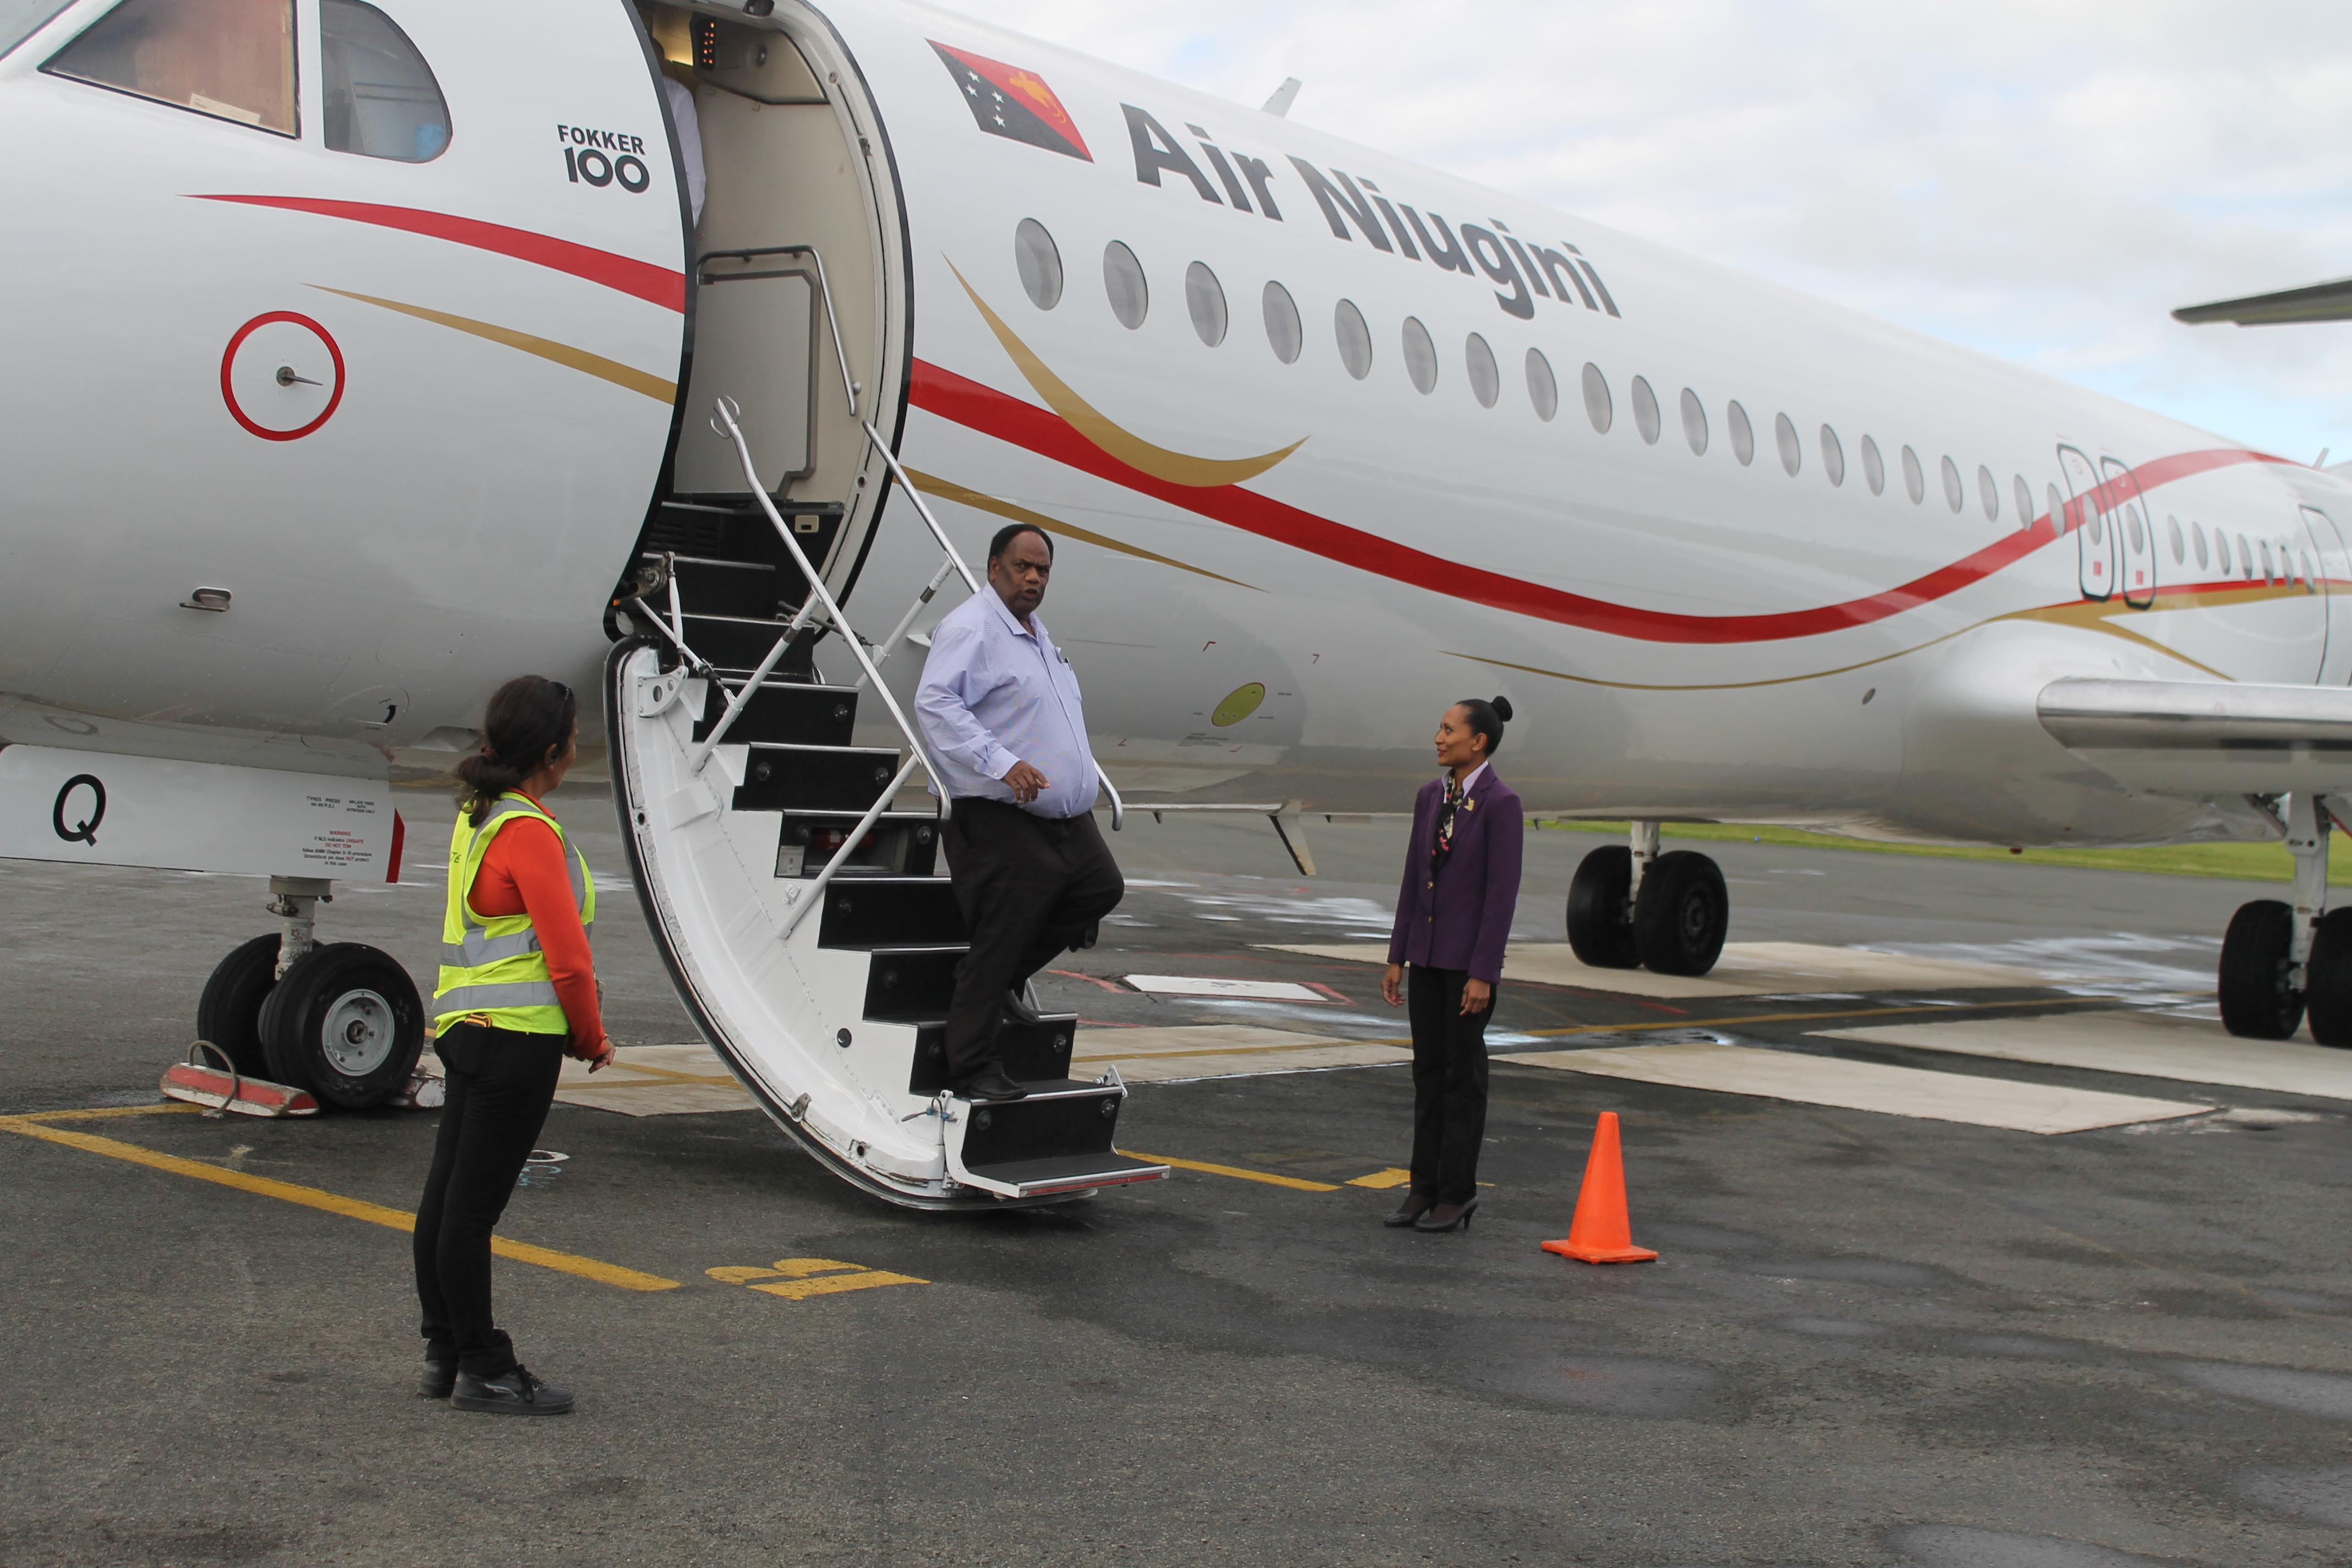 Arrival of Air Niugini F100 at Port Vila